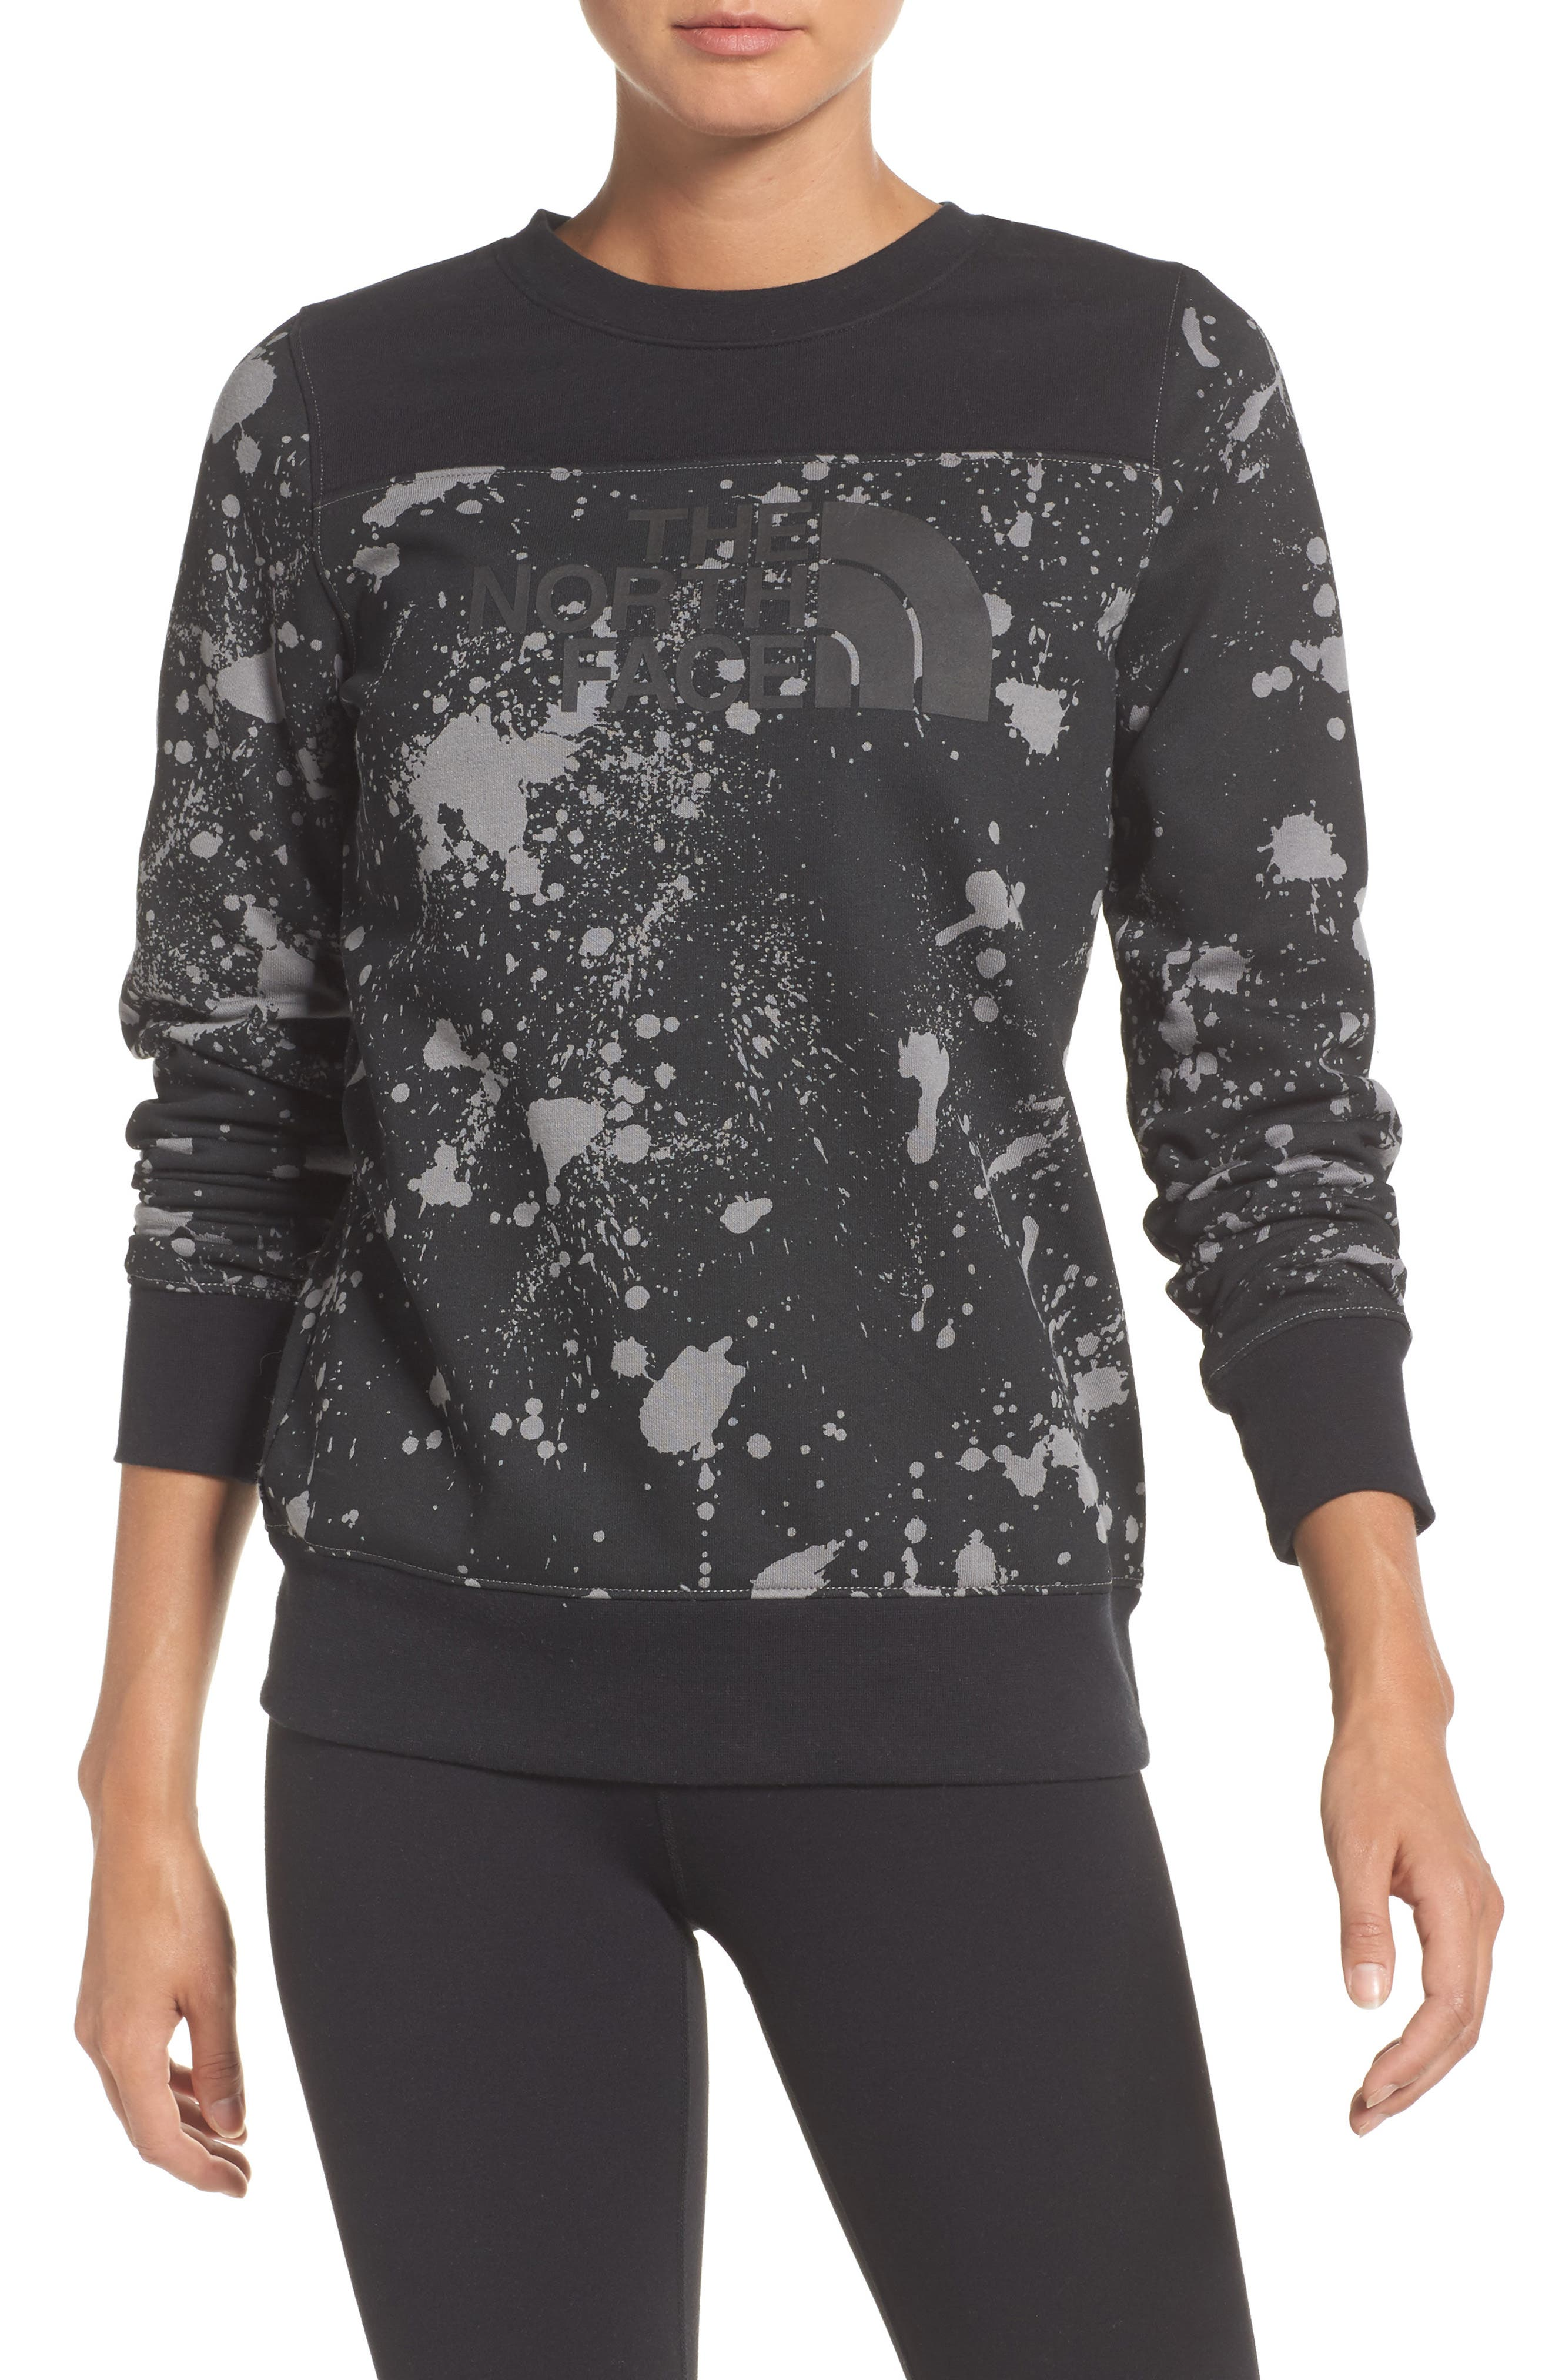 Half Dome Sweatshirt,                         Main,                         color, Tnf Black Splatter Print